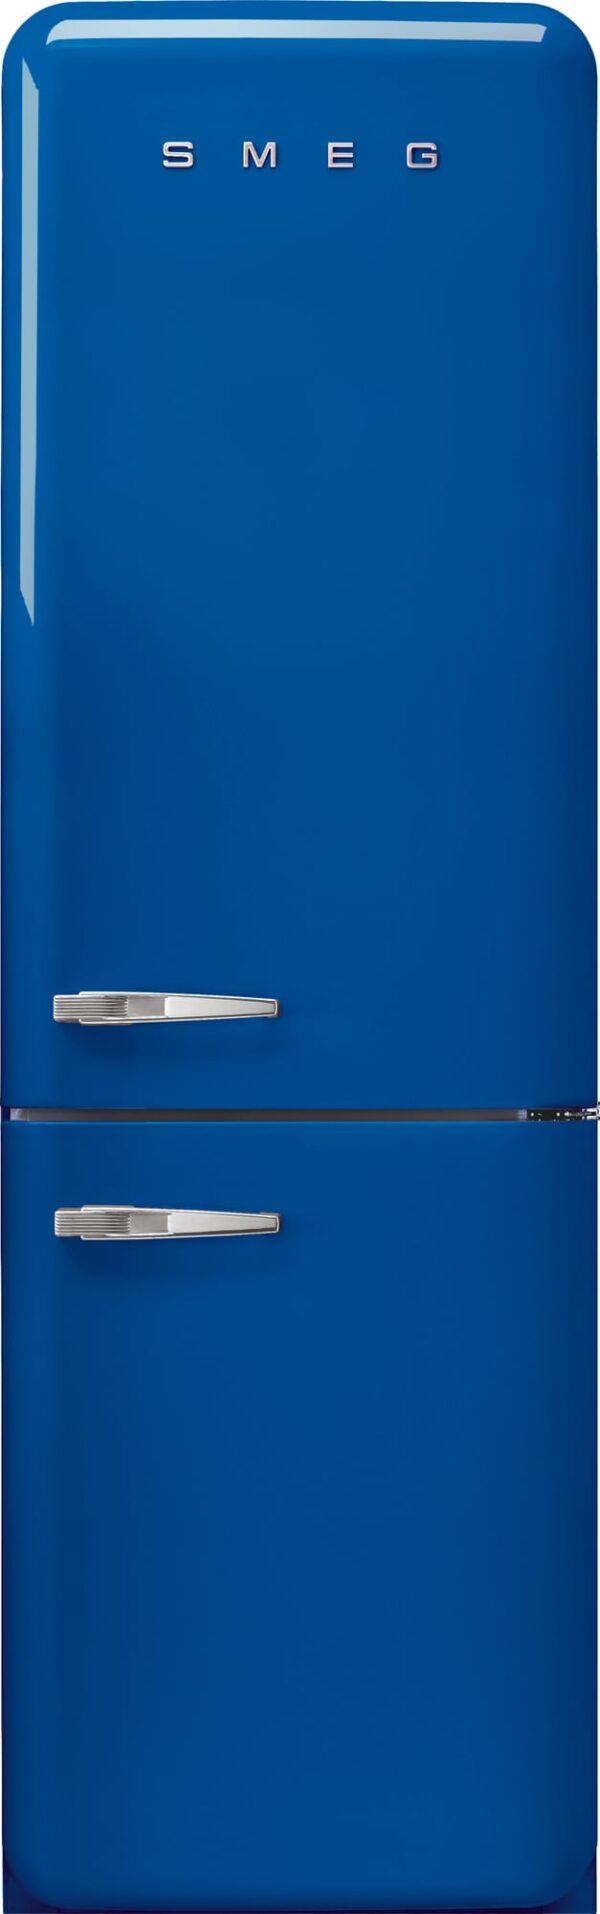 Smeg 50's Style kølefryseskab FAB32RBE5 (blå)